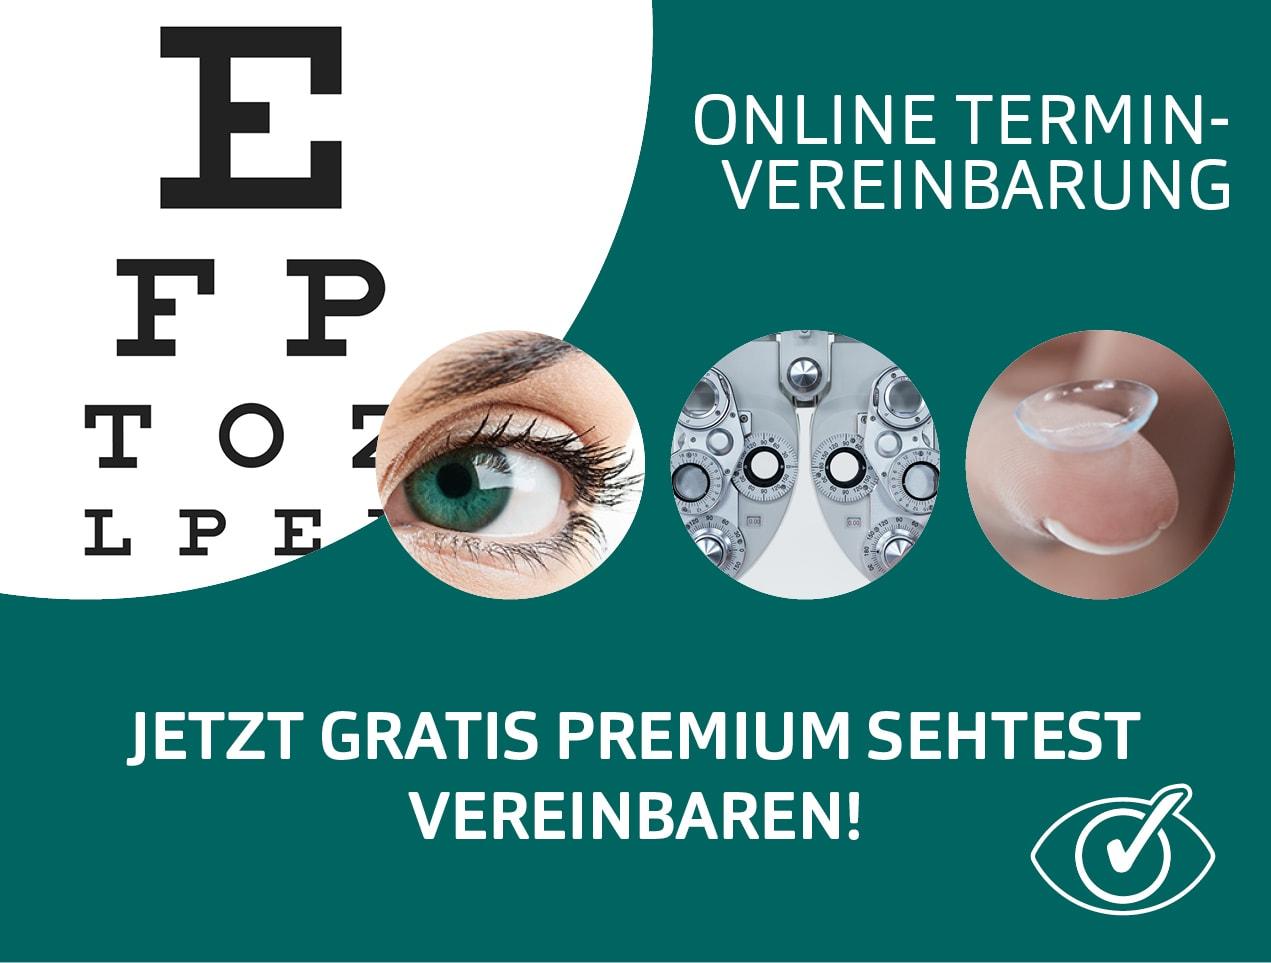 PEARLE Website Kachel Online Sehtest Termin 610x462 RZ